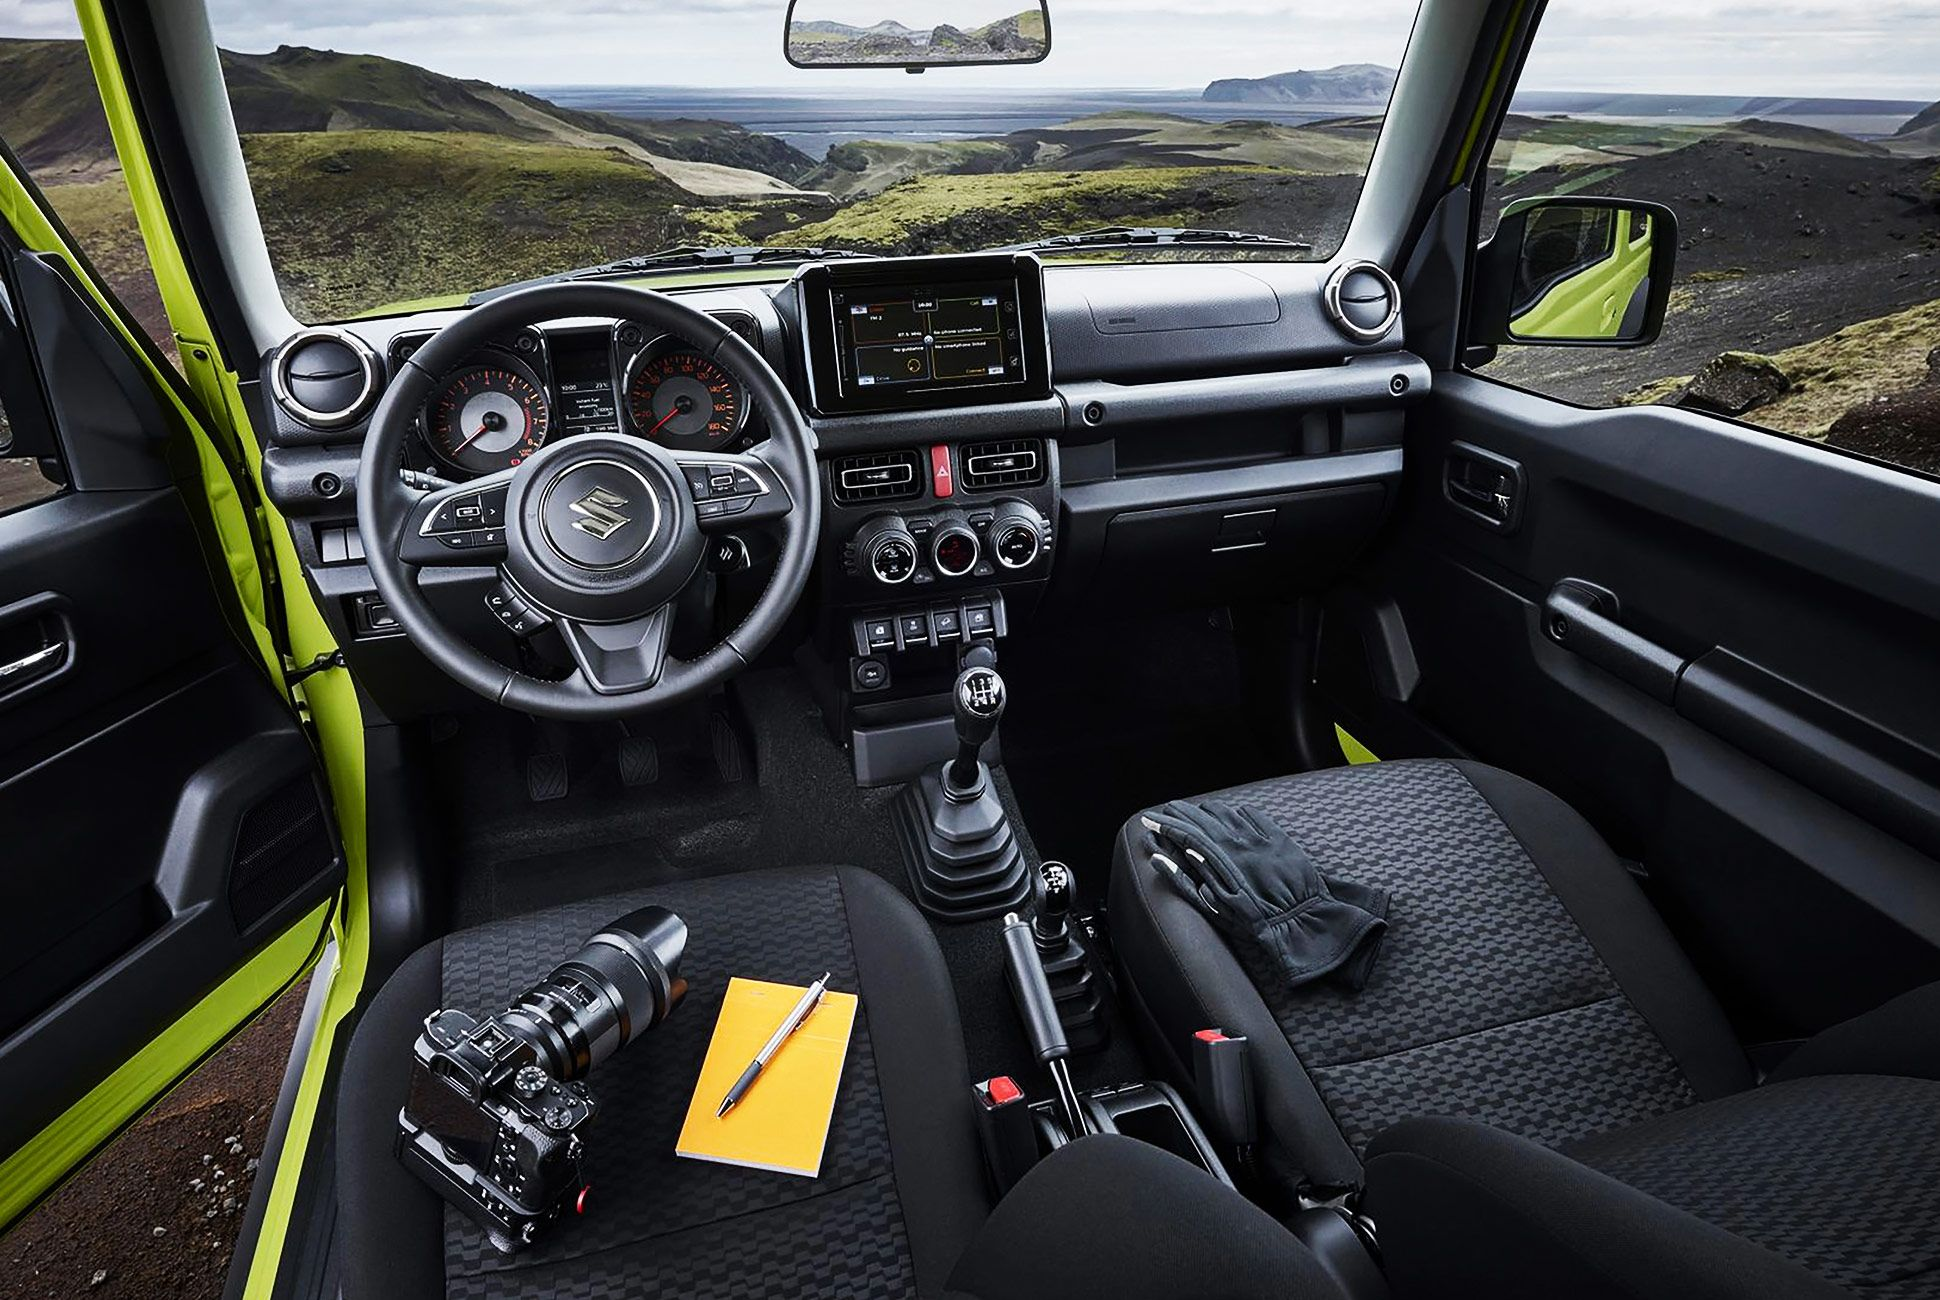 Suzuki-Jimny-Design-Award-gear-patrol-slide-5